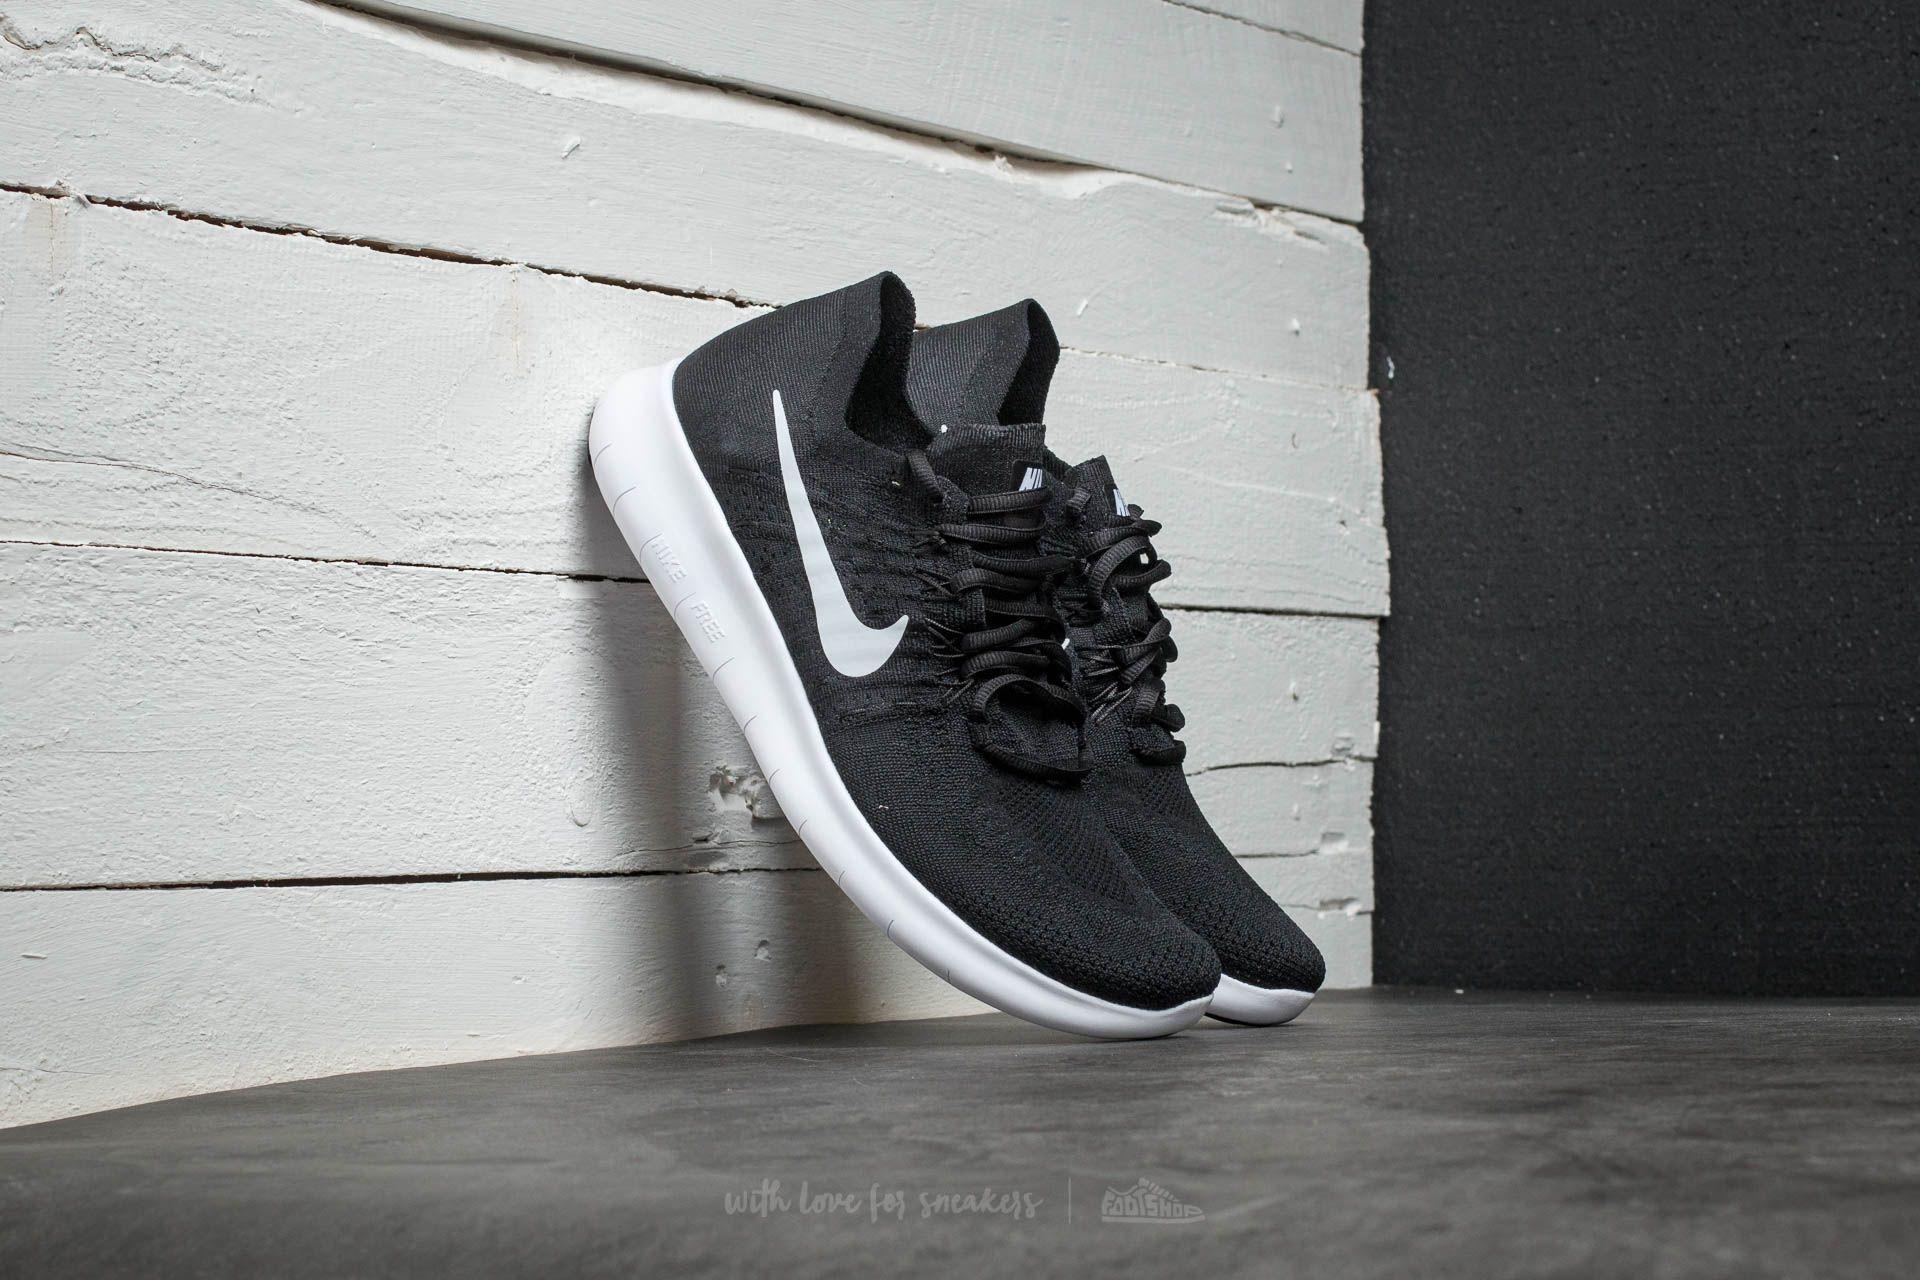 on sale b3764 400e5 Nike Free Run Flyknit 2017. Black  White- Anthracite